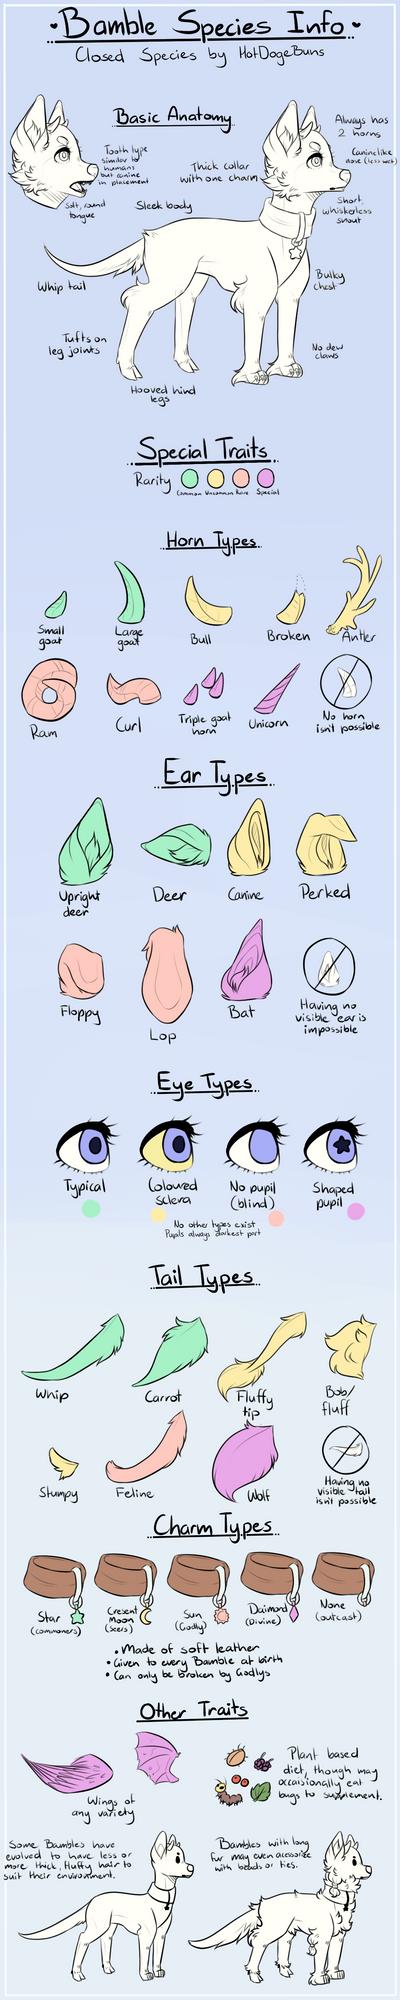 Bamble Species Info by HotDogeBuns